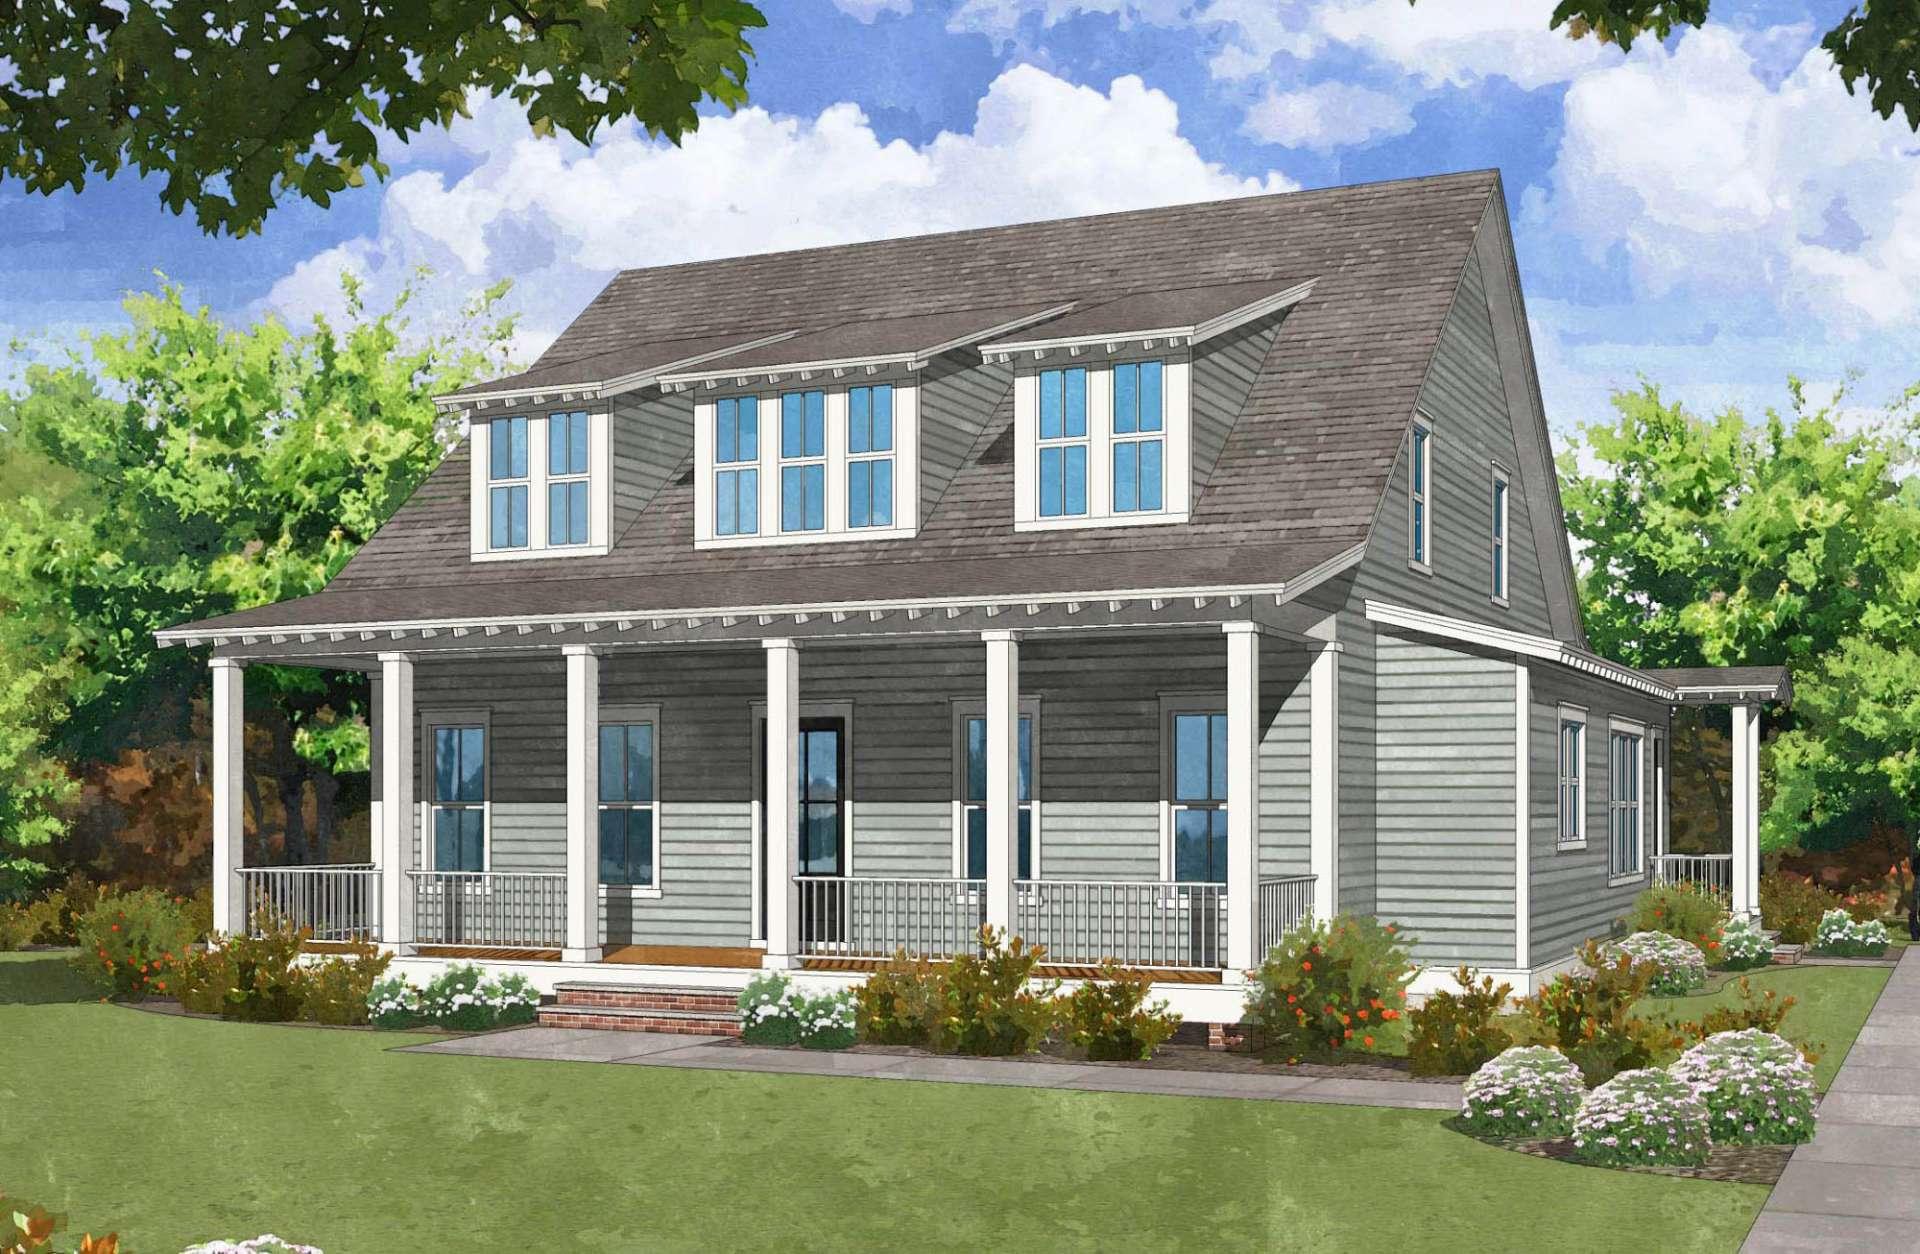 Single Family for Sale at Carolina Park - Albrecht 1538 Banning Street Mount Pleasant, South Carolina 29466 United States